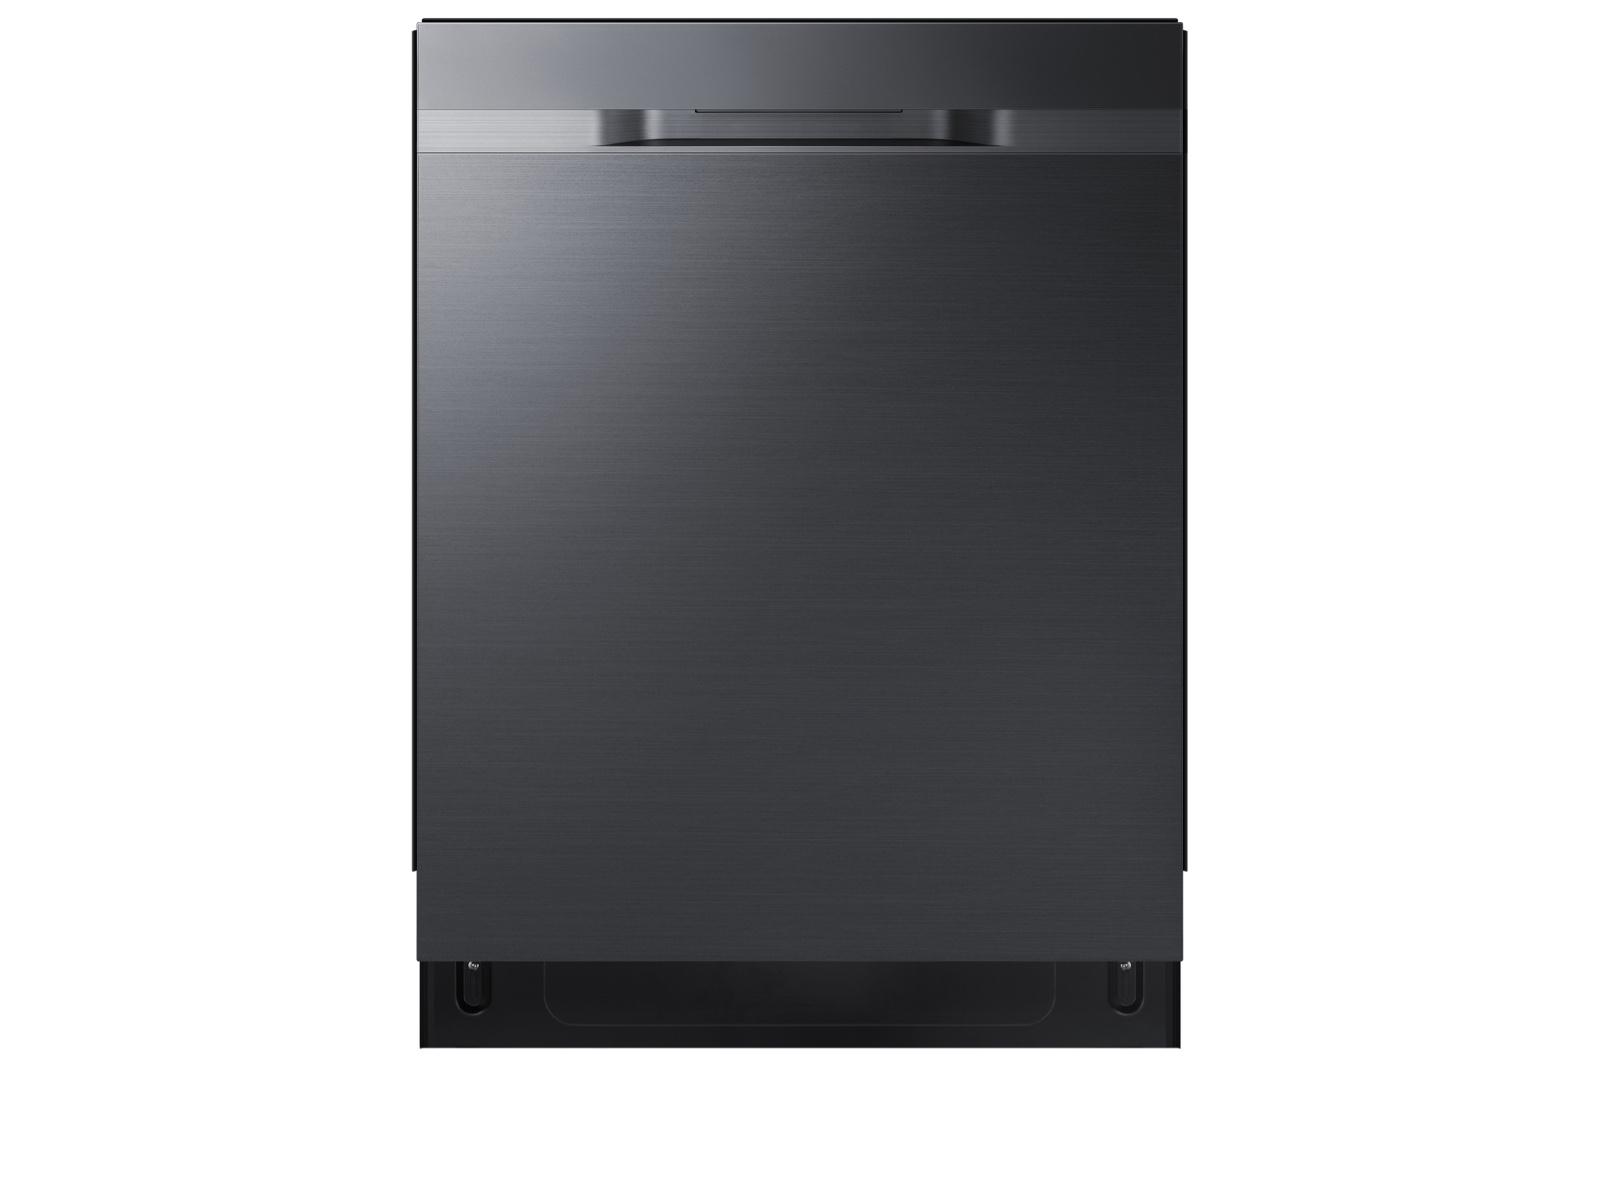 Shop StormWash™ 42 dBA Dishwasher in Black Stainless Steel from Samsung on Openhaus